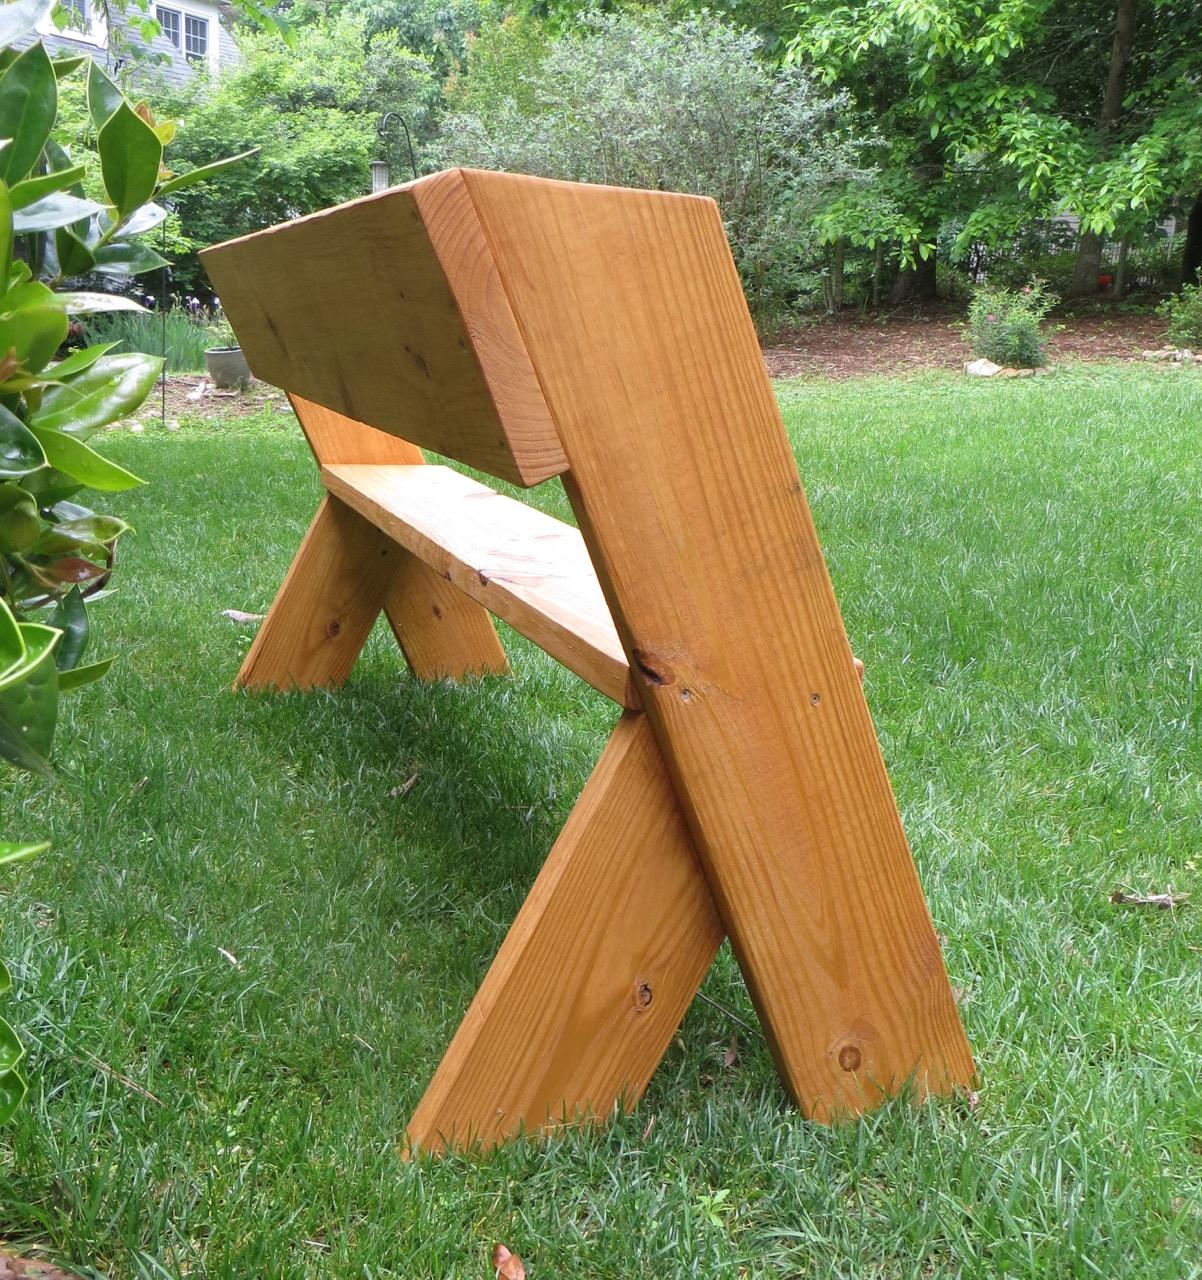 Simple Outdoor Kitchens: DIY Tutorial - $16 Simple Outdoor Wood Bench